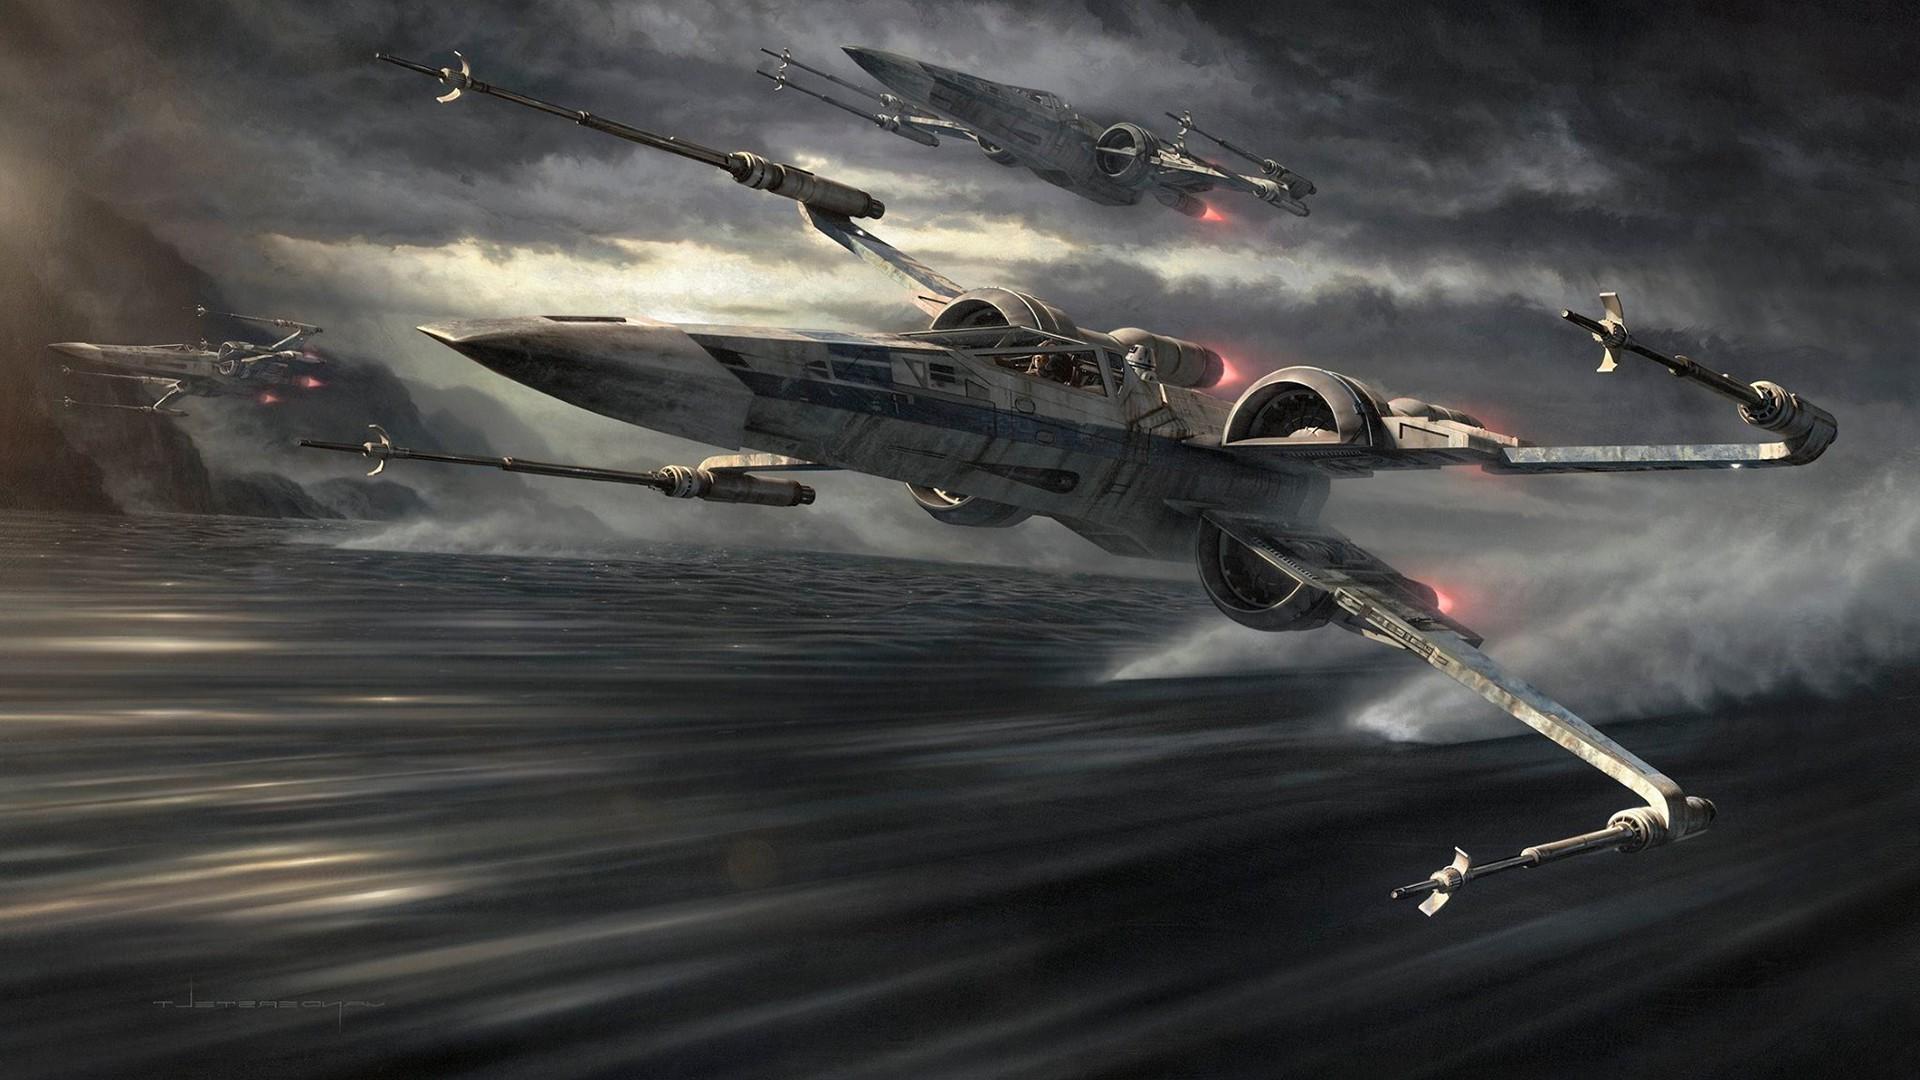 Aereo Da Combattimento Cinese : Sfondi guerre stellari aereo aerei militari wing